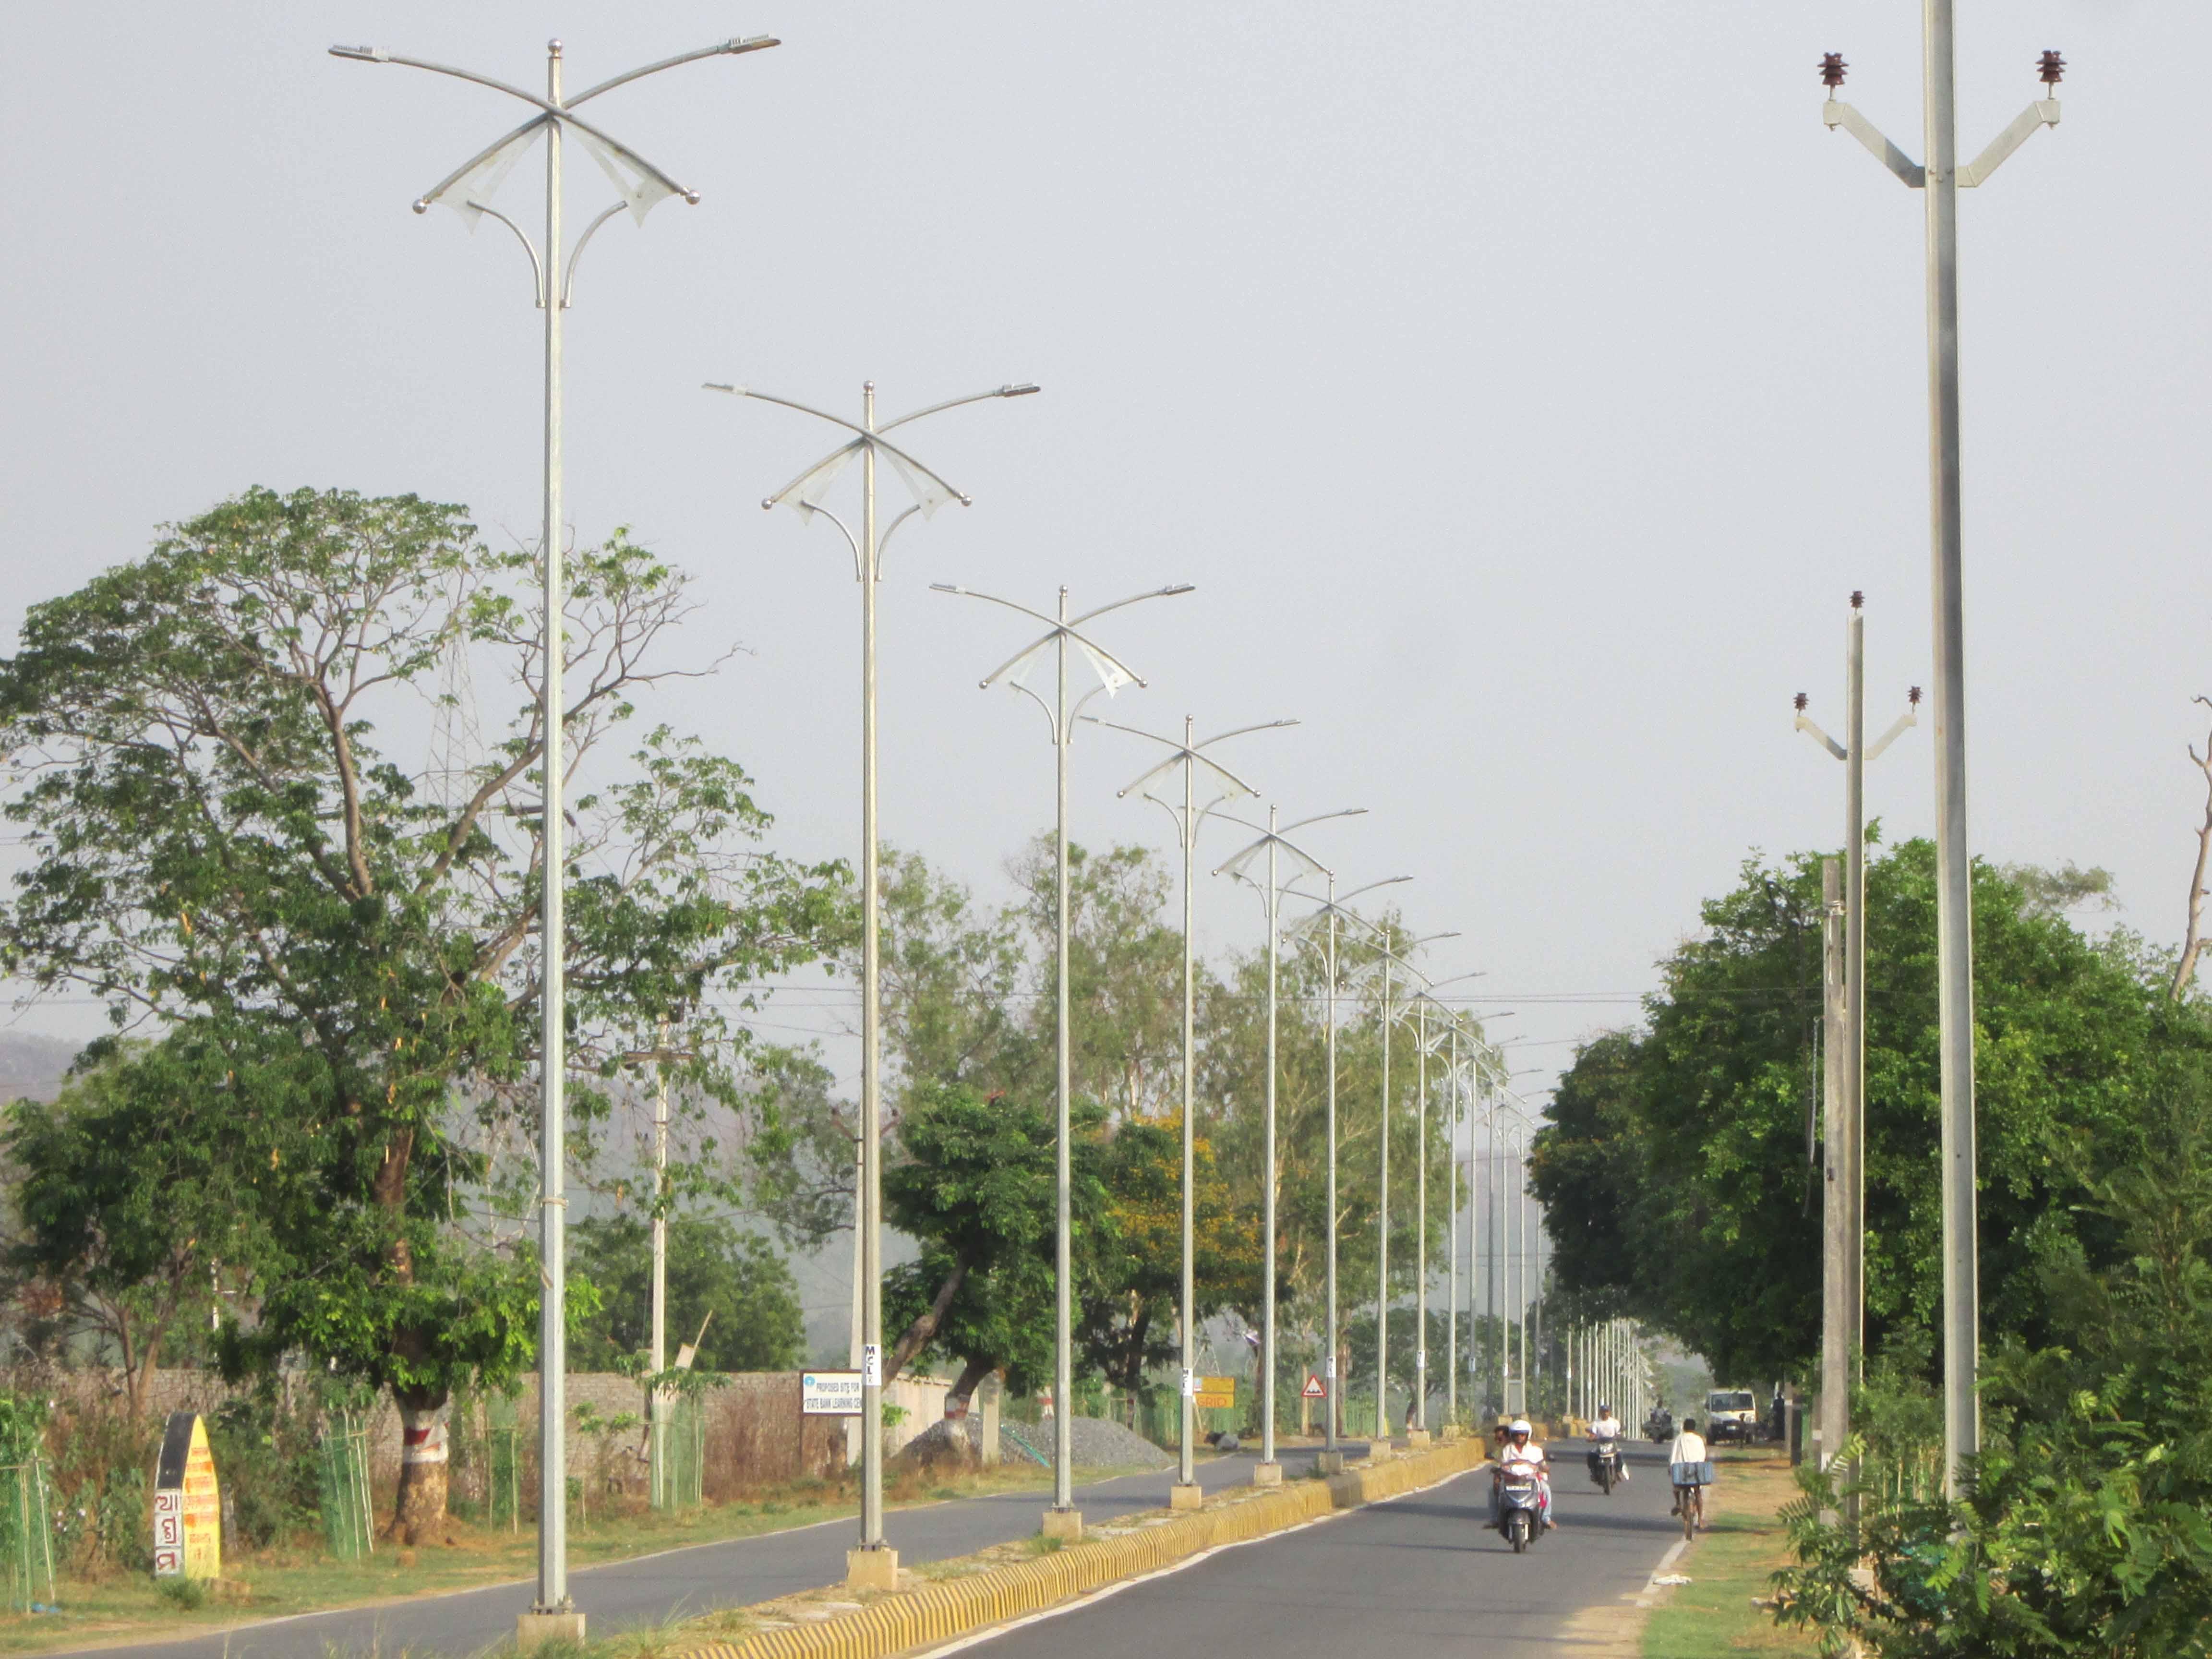 BURLA MAIN ROAD, SAMBALPUR